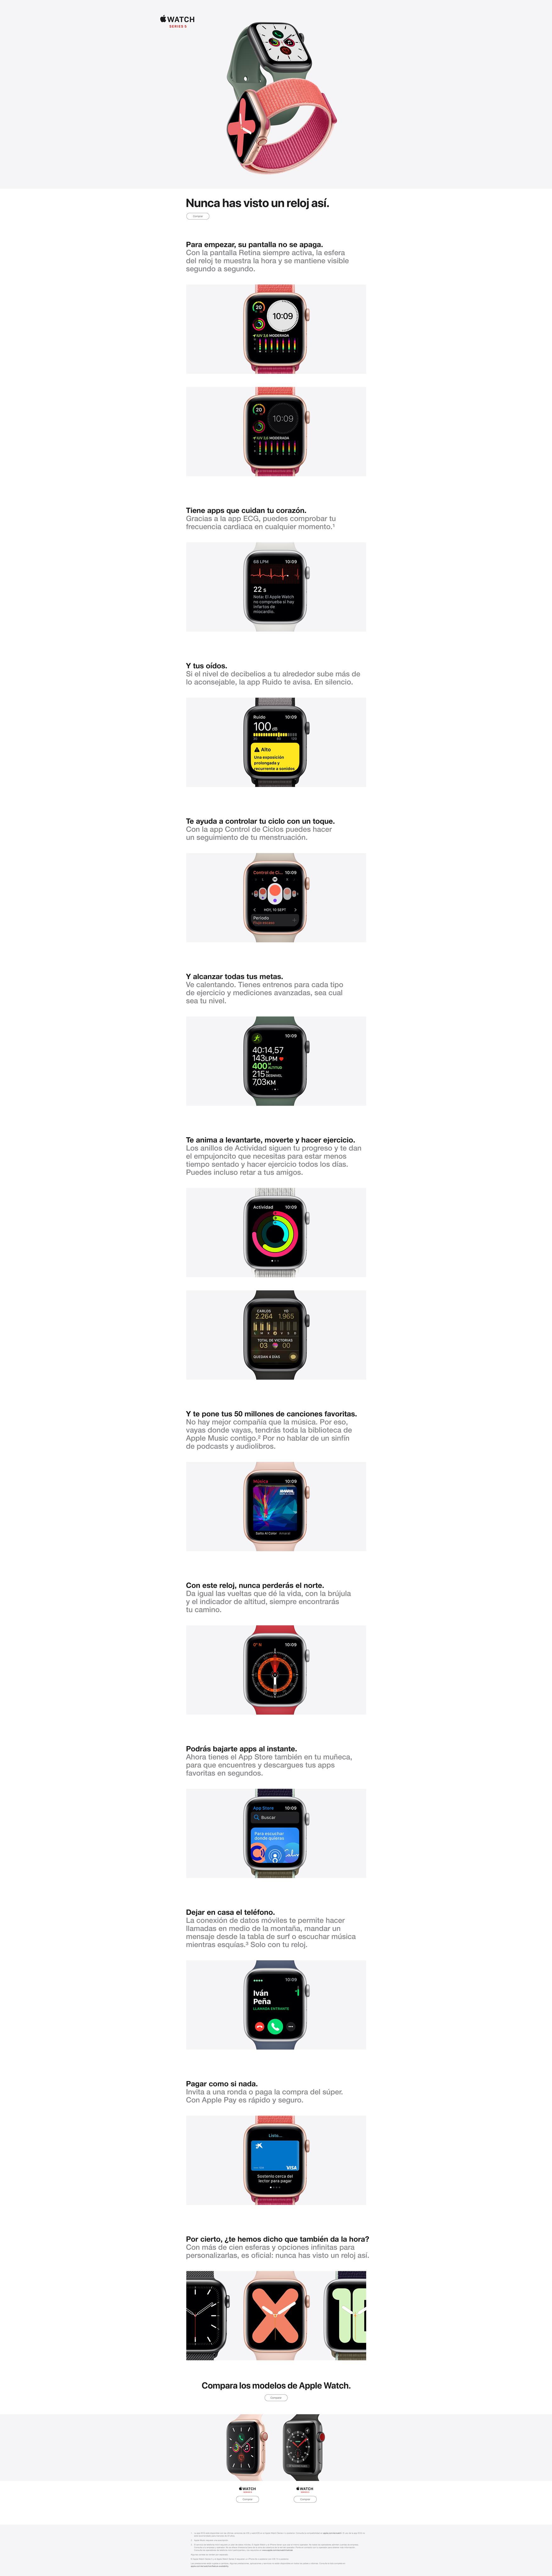 nuevo apple watch series 5